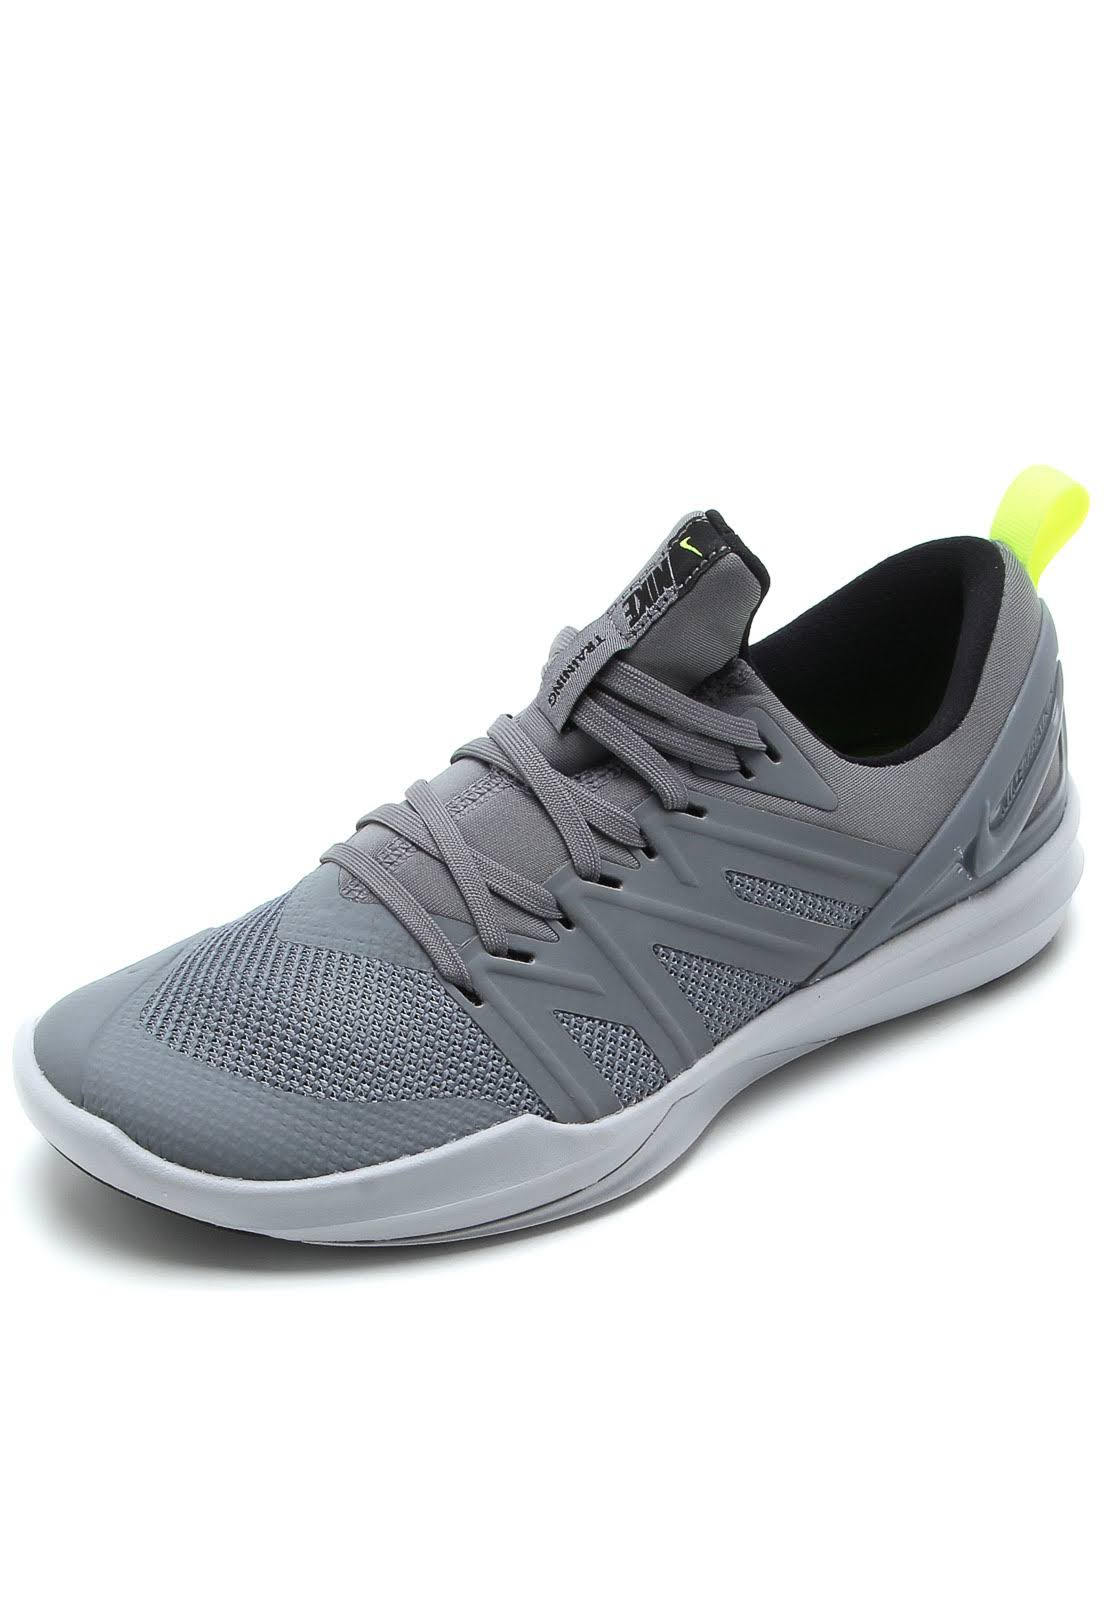 Victory Trainer Grigio Elite Nike 42 Eu m0N8nOvwy